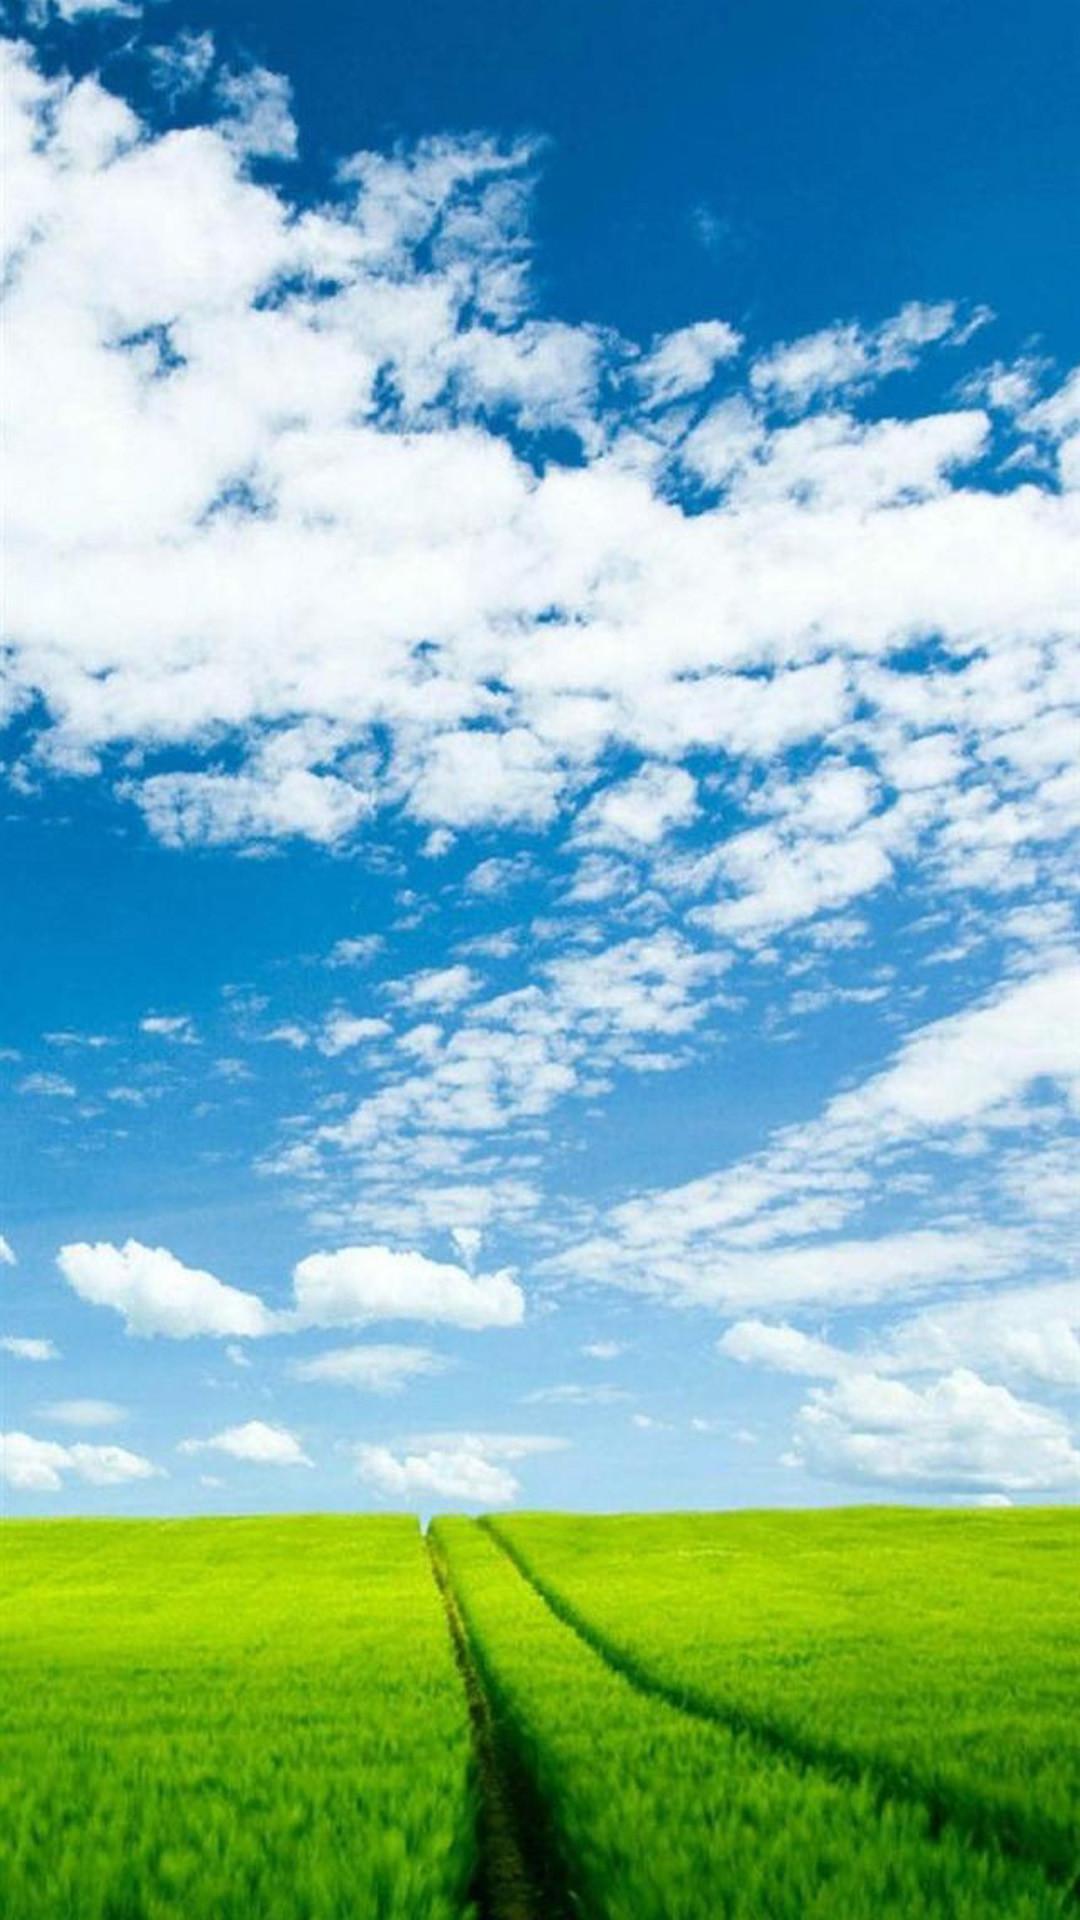 Nature Sunshine Green Corp Field Cloudy Sky iPhone 8 wallpaper